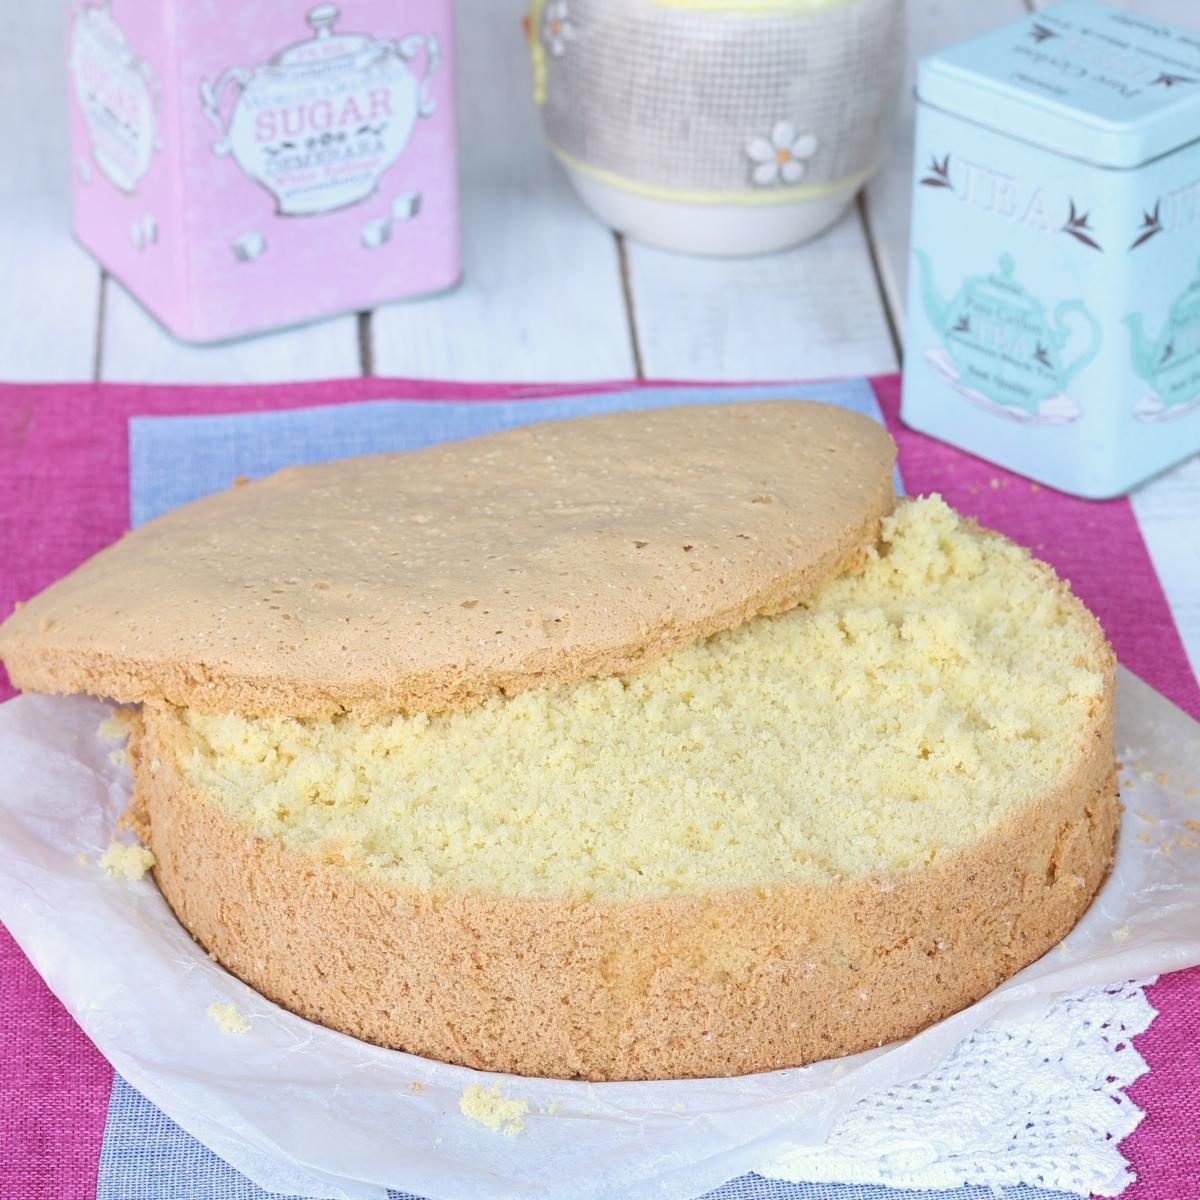 PAN DI SPAGNA SENZA LIEVITO ricetta pan di spagna leggero soffice